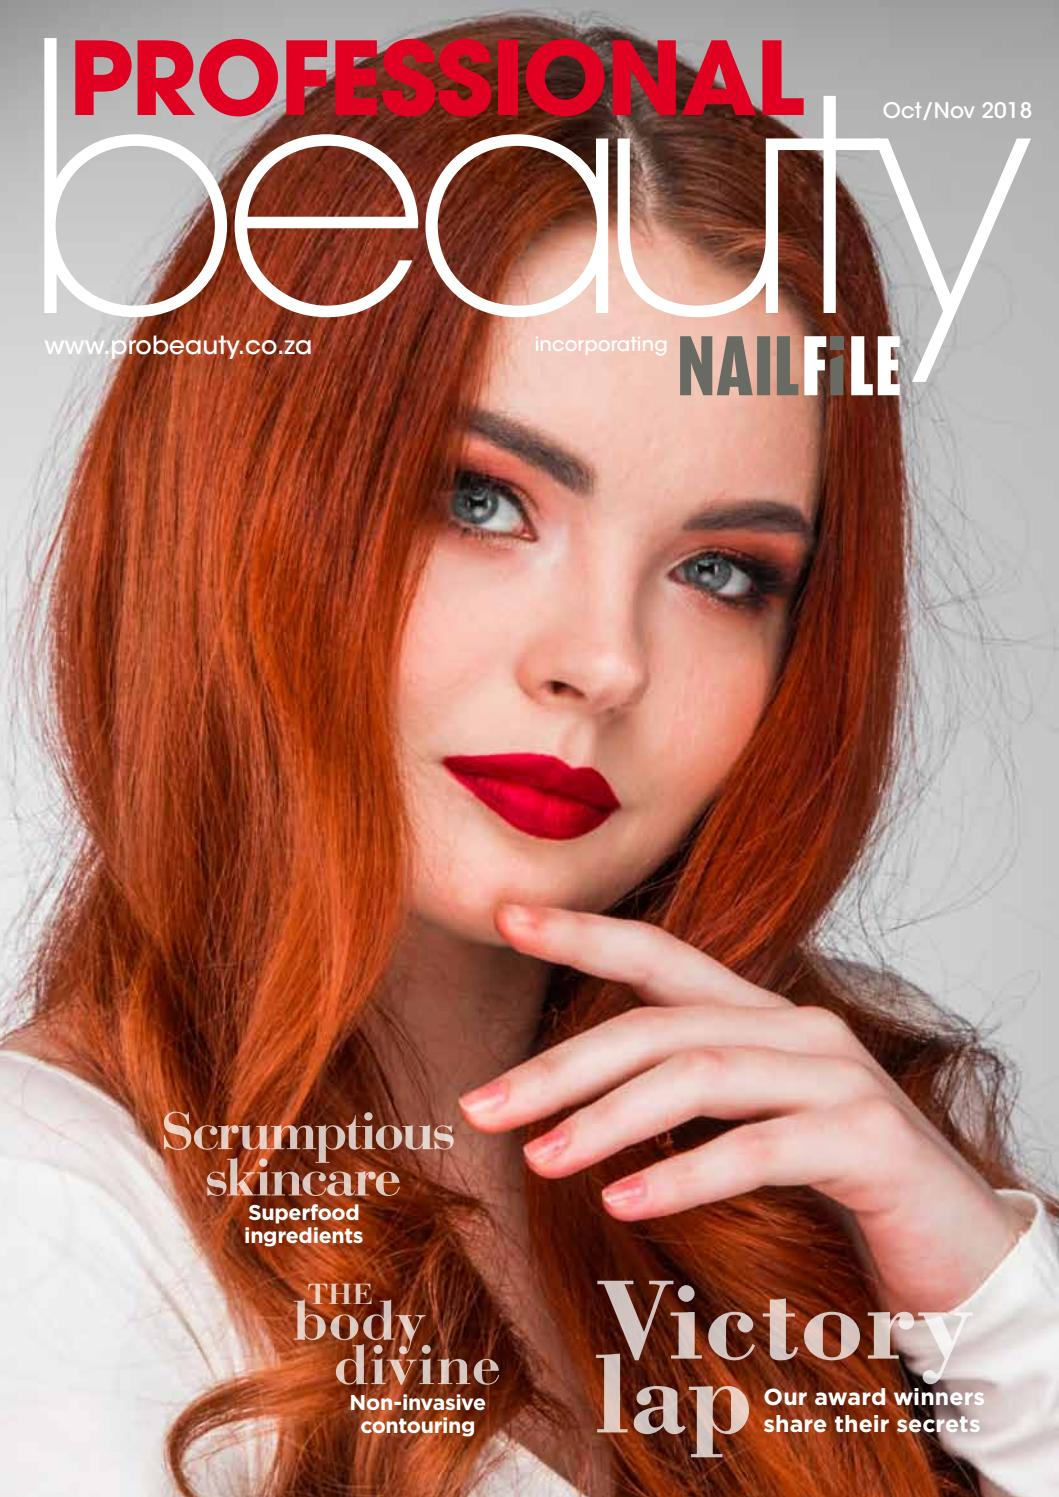 ff4fda2d87d Professional Beauty Magazine by Professional Beauty SA - issuu